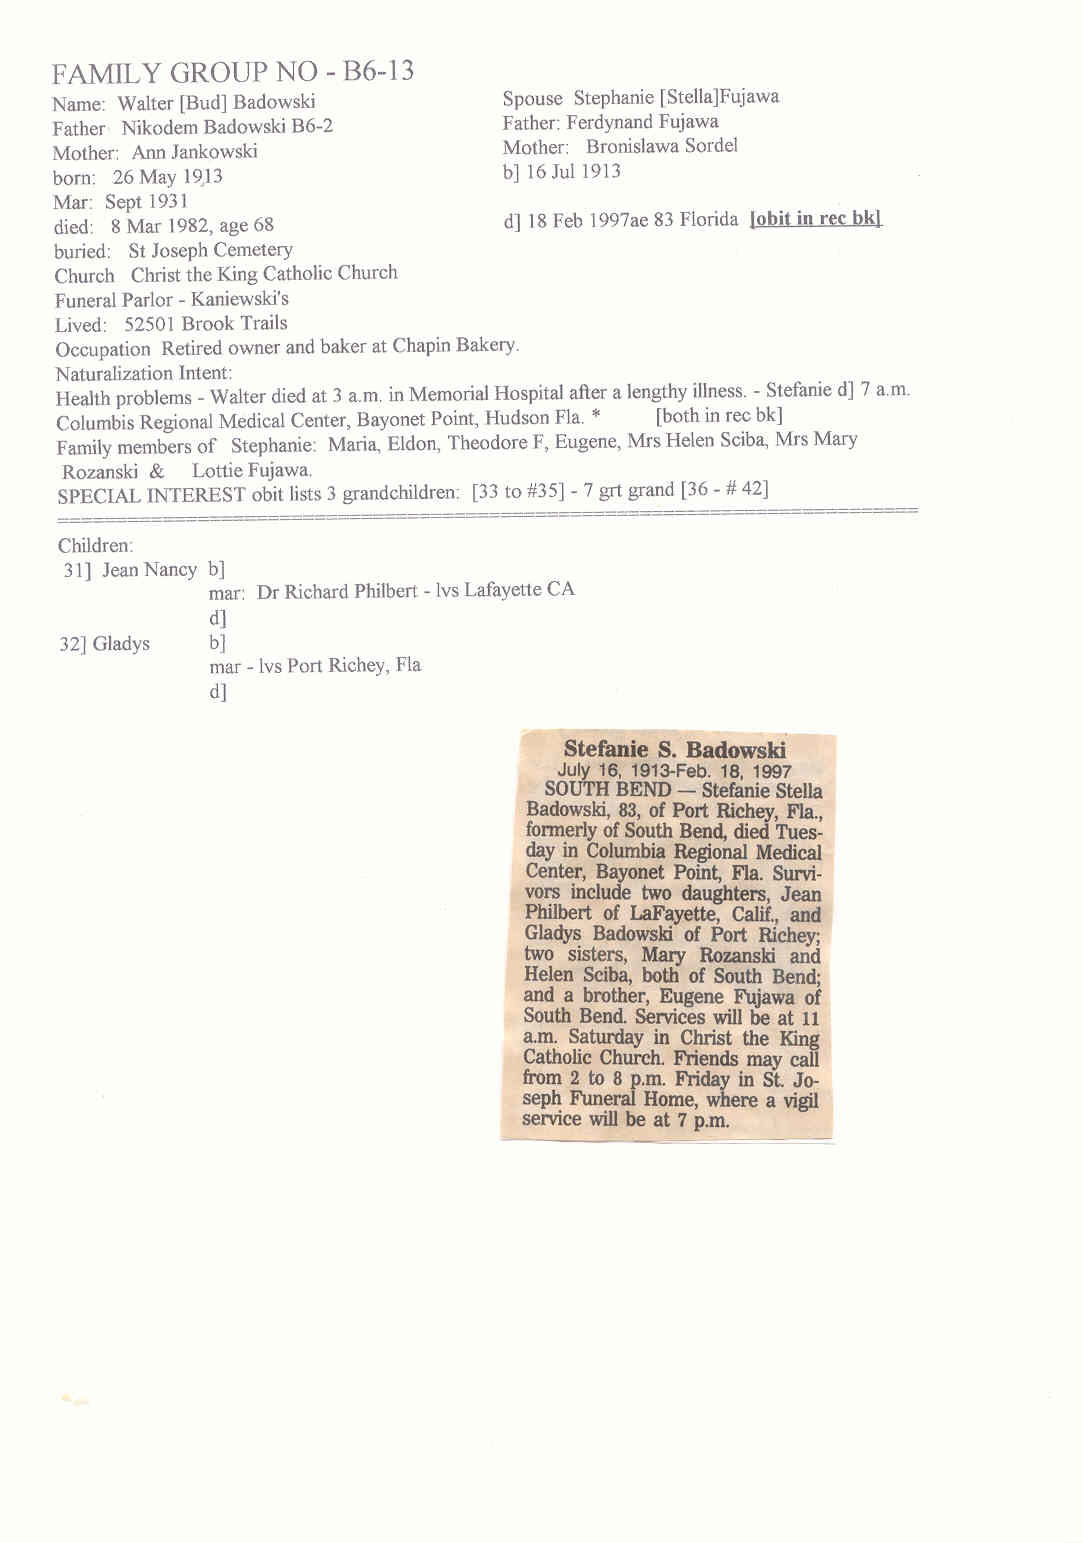 sr 022 essay This document needs to be read in conjuntion with senior secondary school curriculum volume-i and with 303 583 16 urdu (elective) 003 585 17 limboo 125 587 18 lepcha 126 589 19 bhutia 195 593 20 sanskrit (core) 322 598 21 sanskrit (elective) 022 604 galileo (essay) satyendranath basu 4.